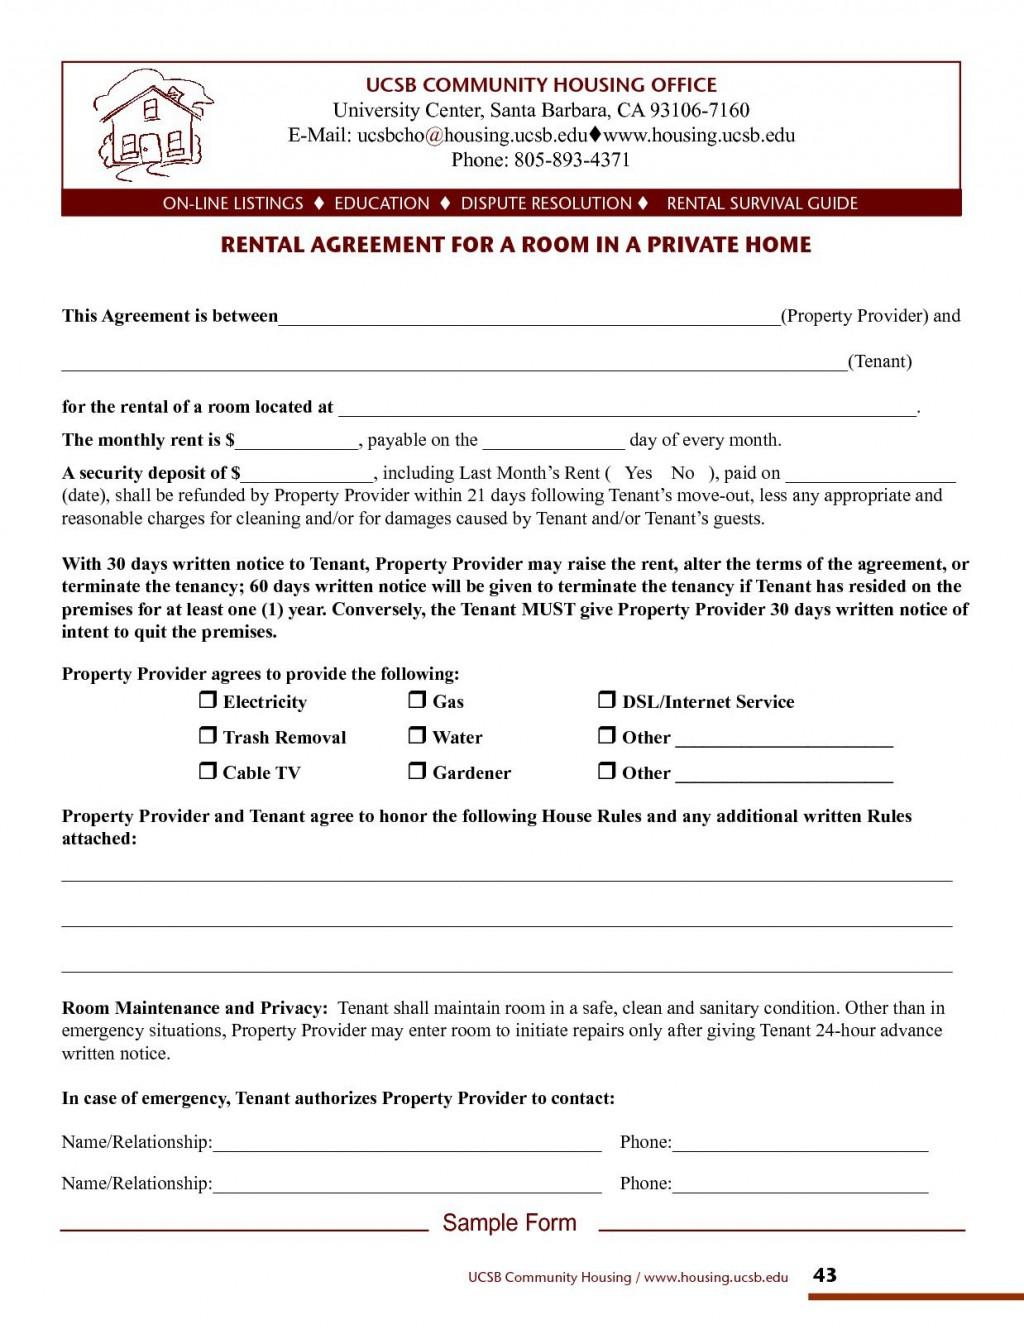 003 Sensational House Rental Agreement Template Inspiration  Home Free Ireland FormLarge